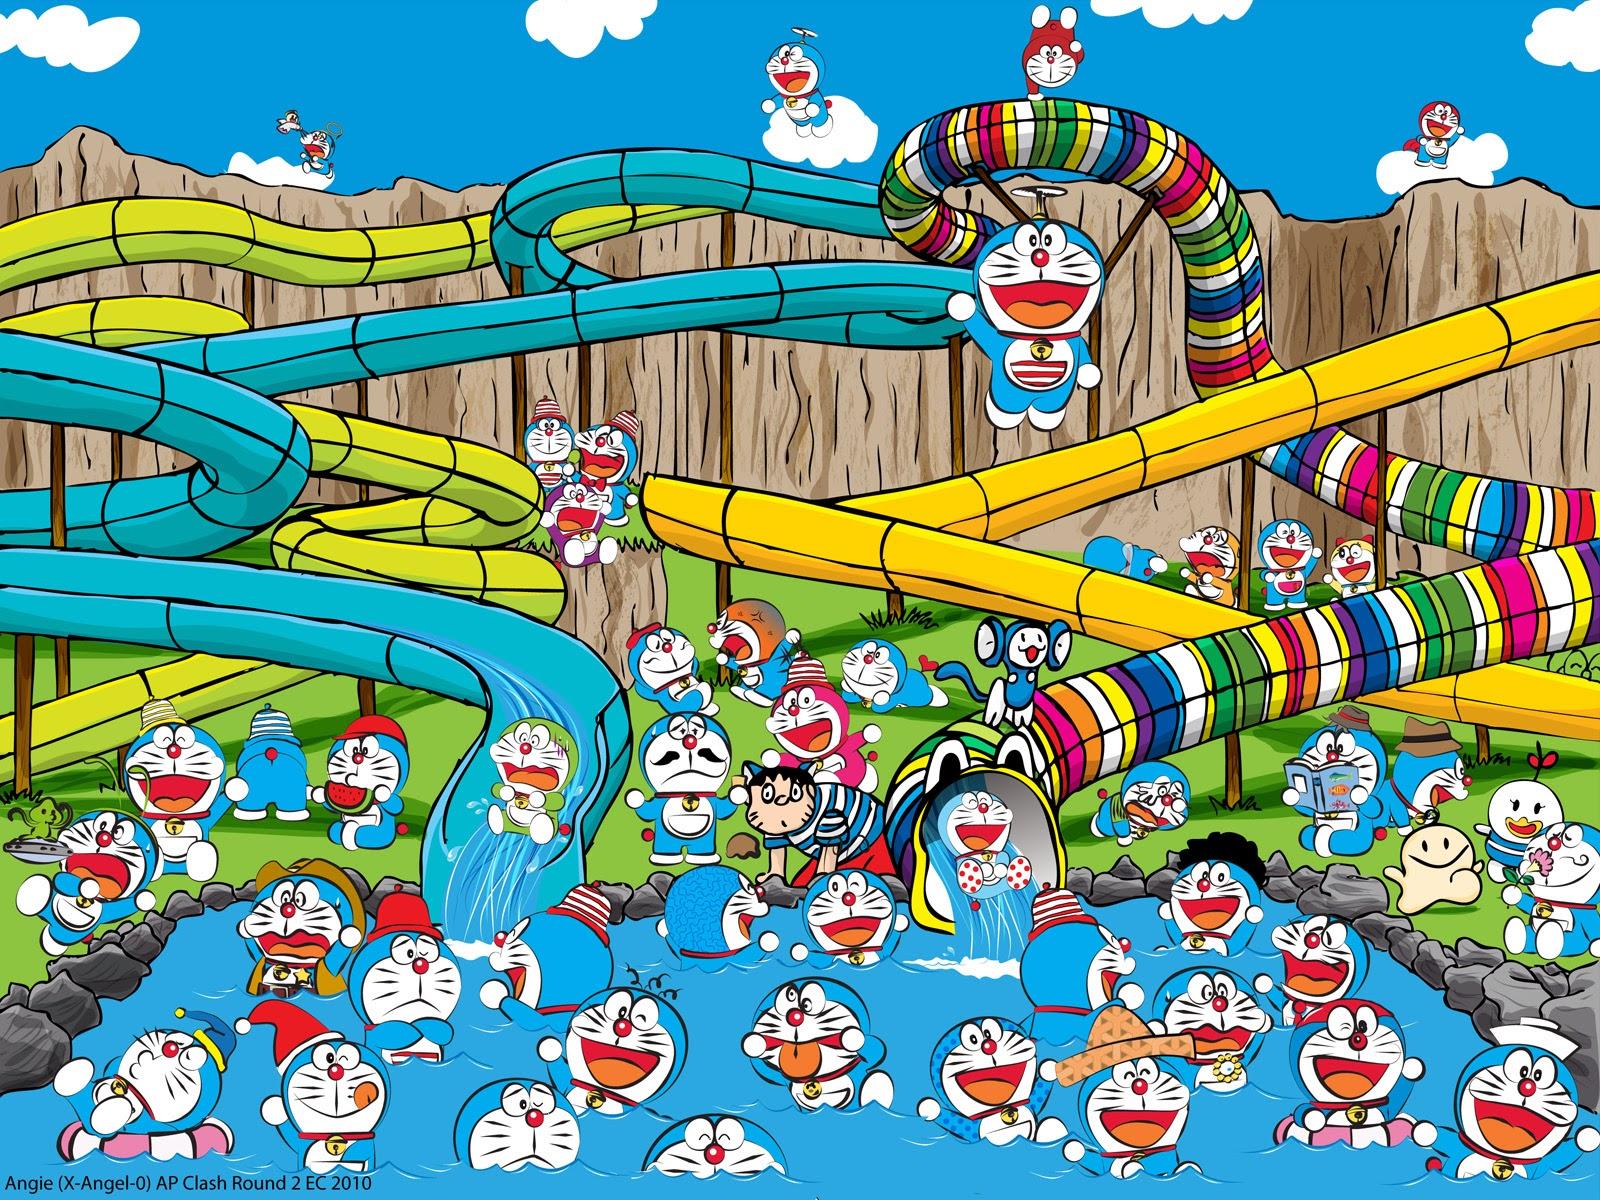 Unduh 1070+ Wallpaper Doraemon Cantik Foto Paling Keren